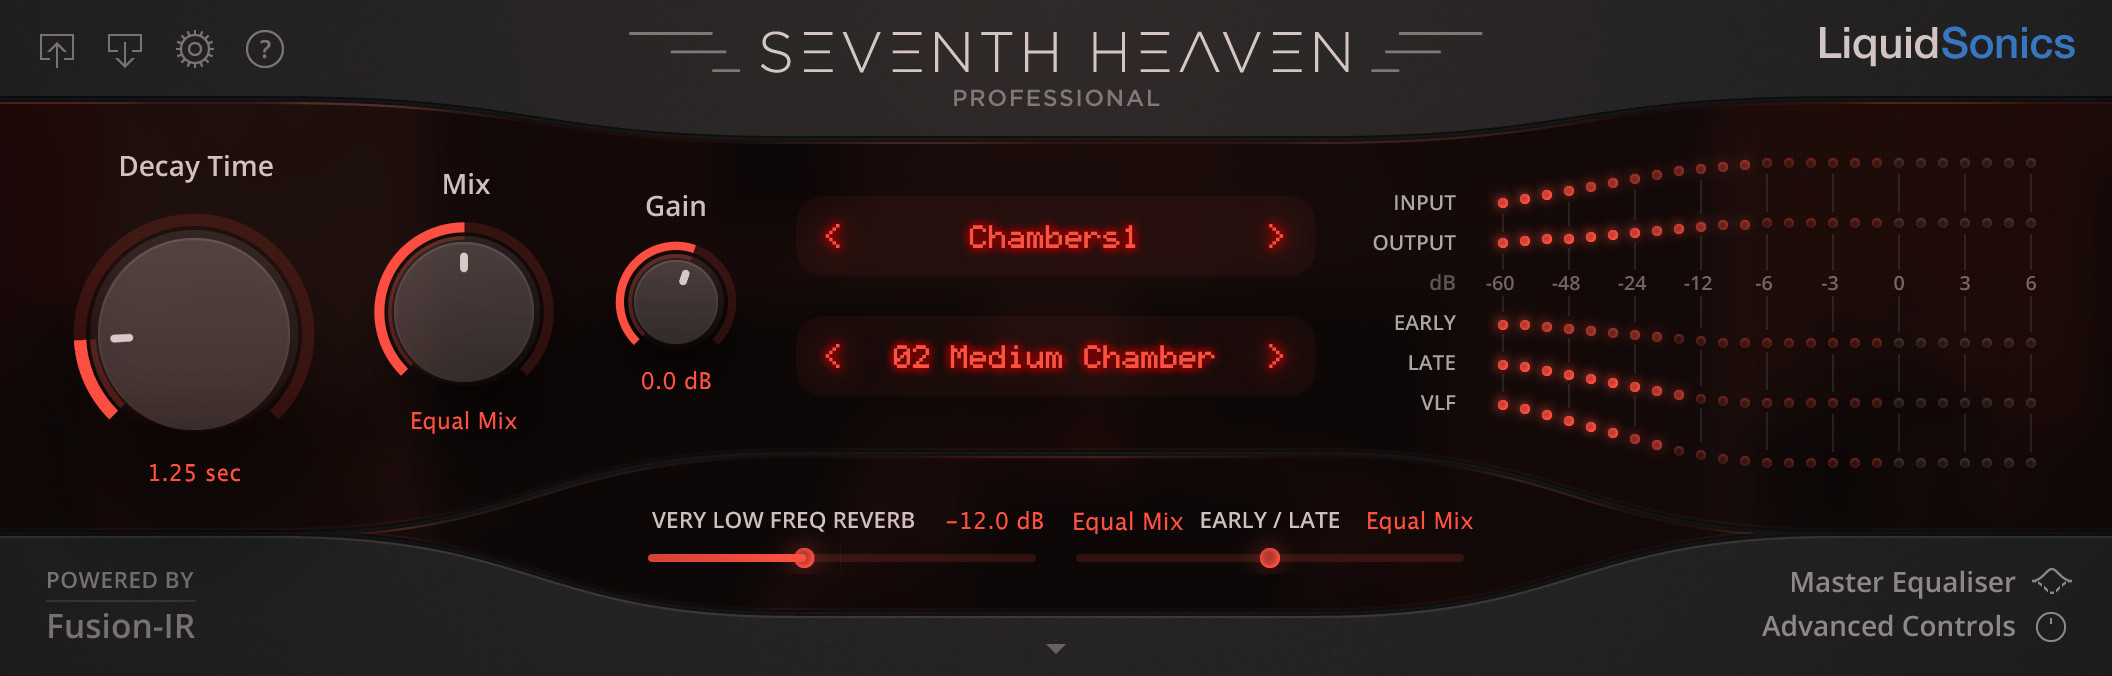 seventh_heaven_professional_01.jpg